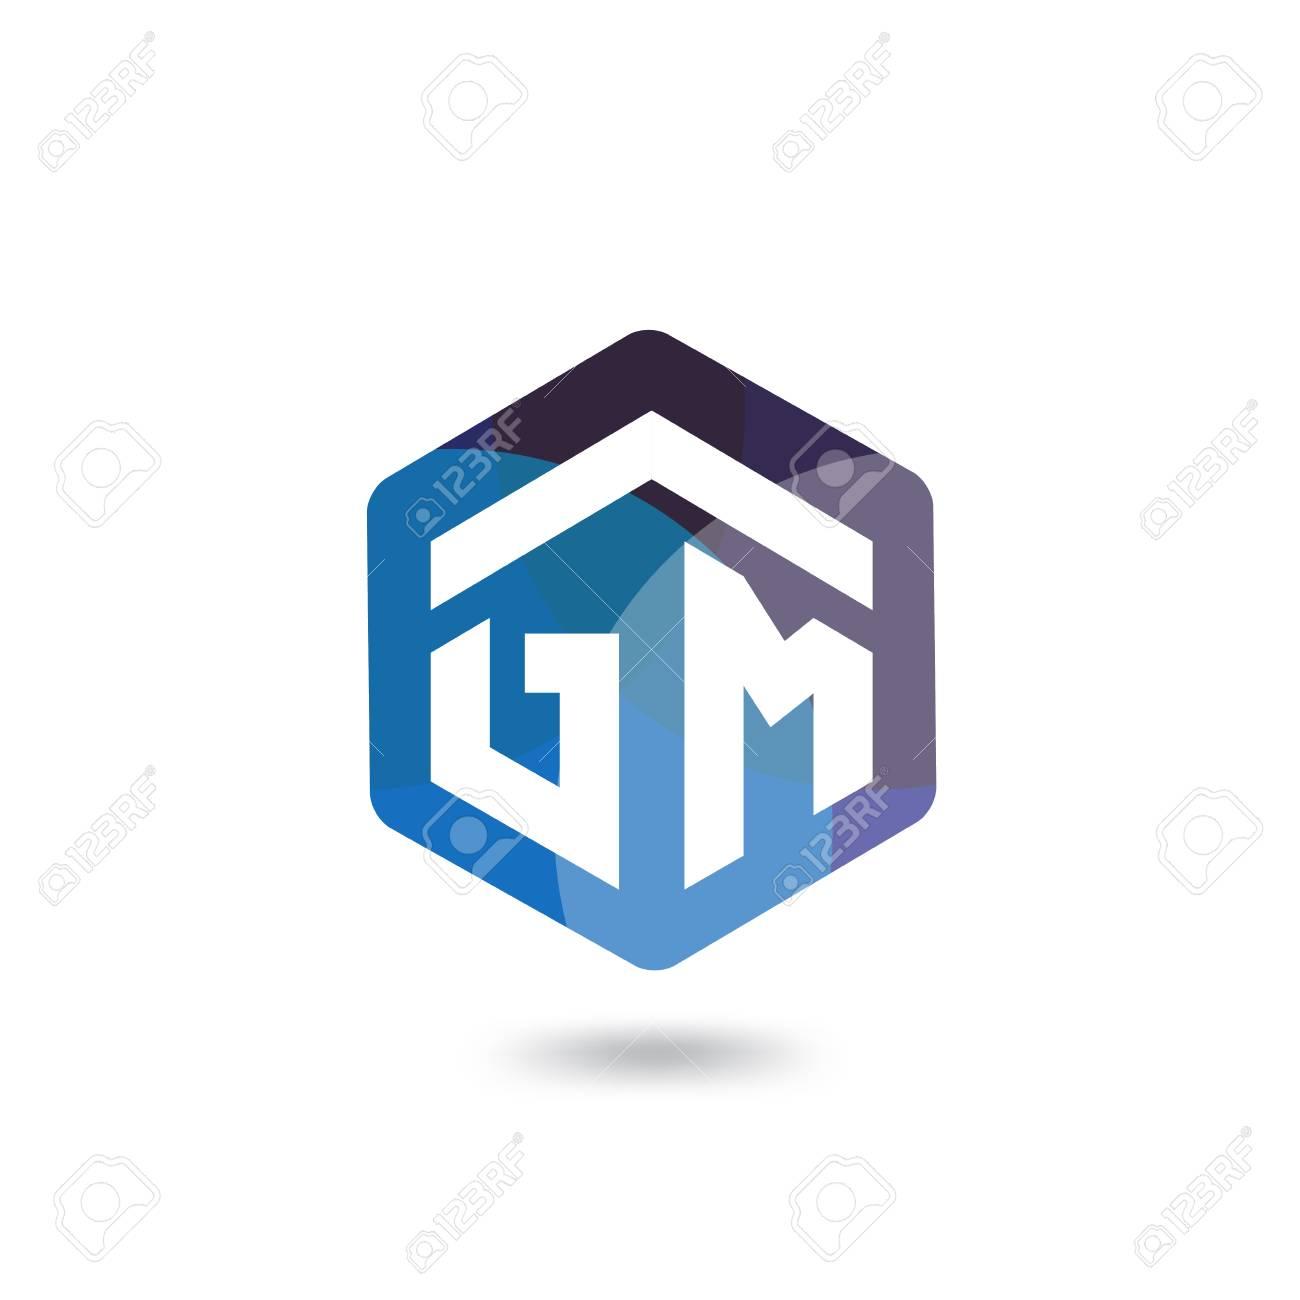 GM Initial letter hexagonal logo vector template - 106854410